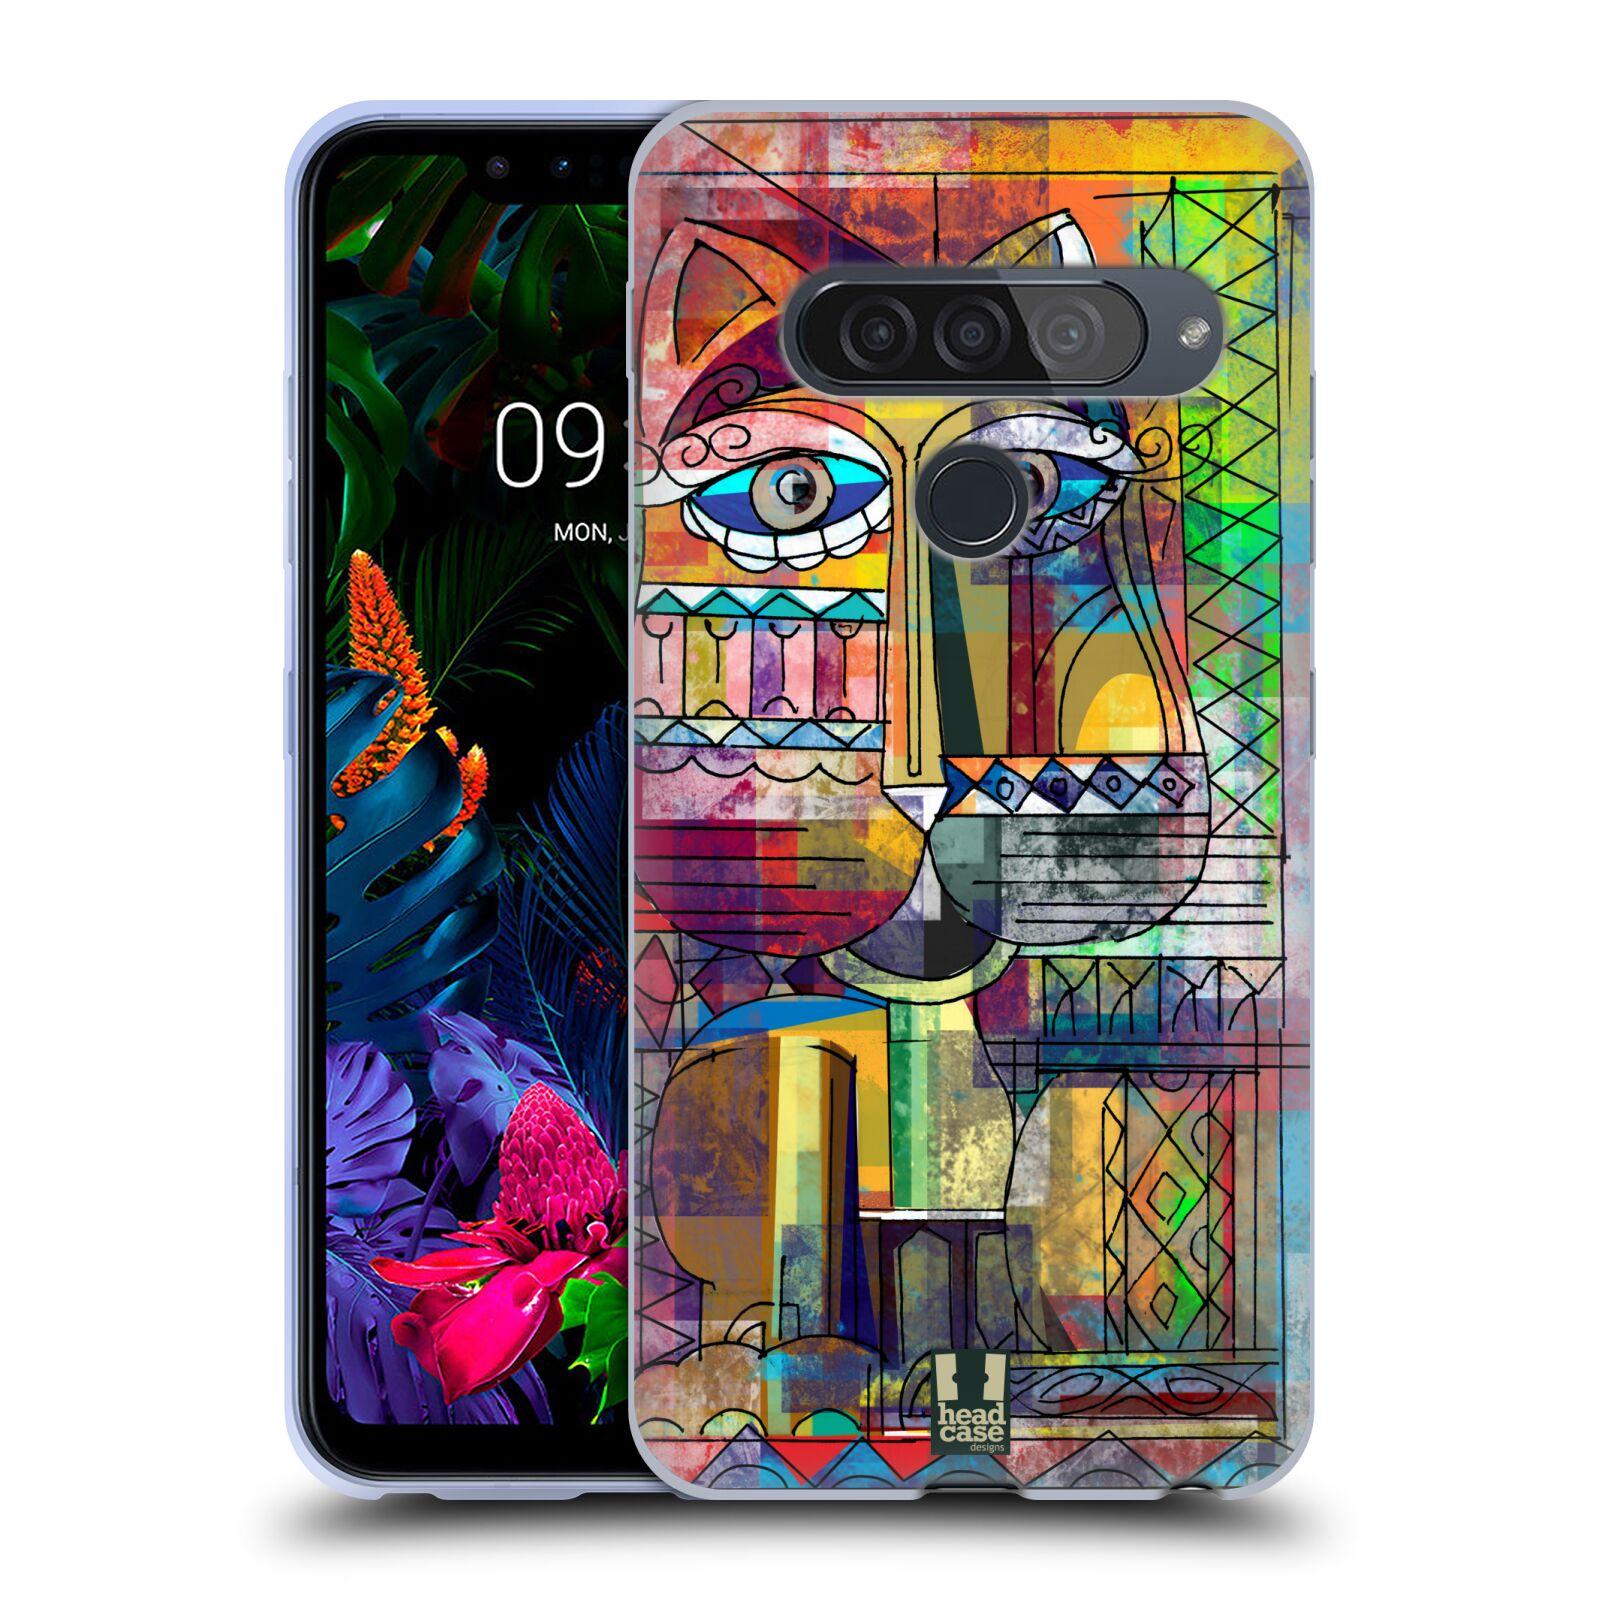 Silikonové pouzdro na mobil LG G8s ThinQ - Head Case - AZTEC KORAT